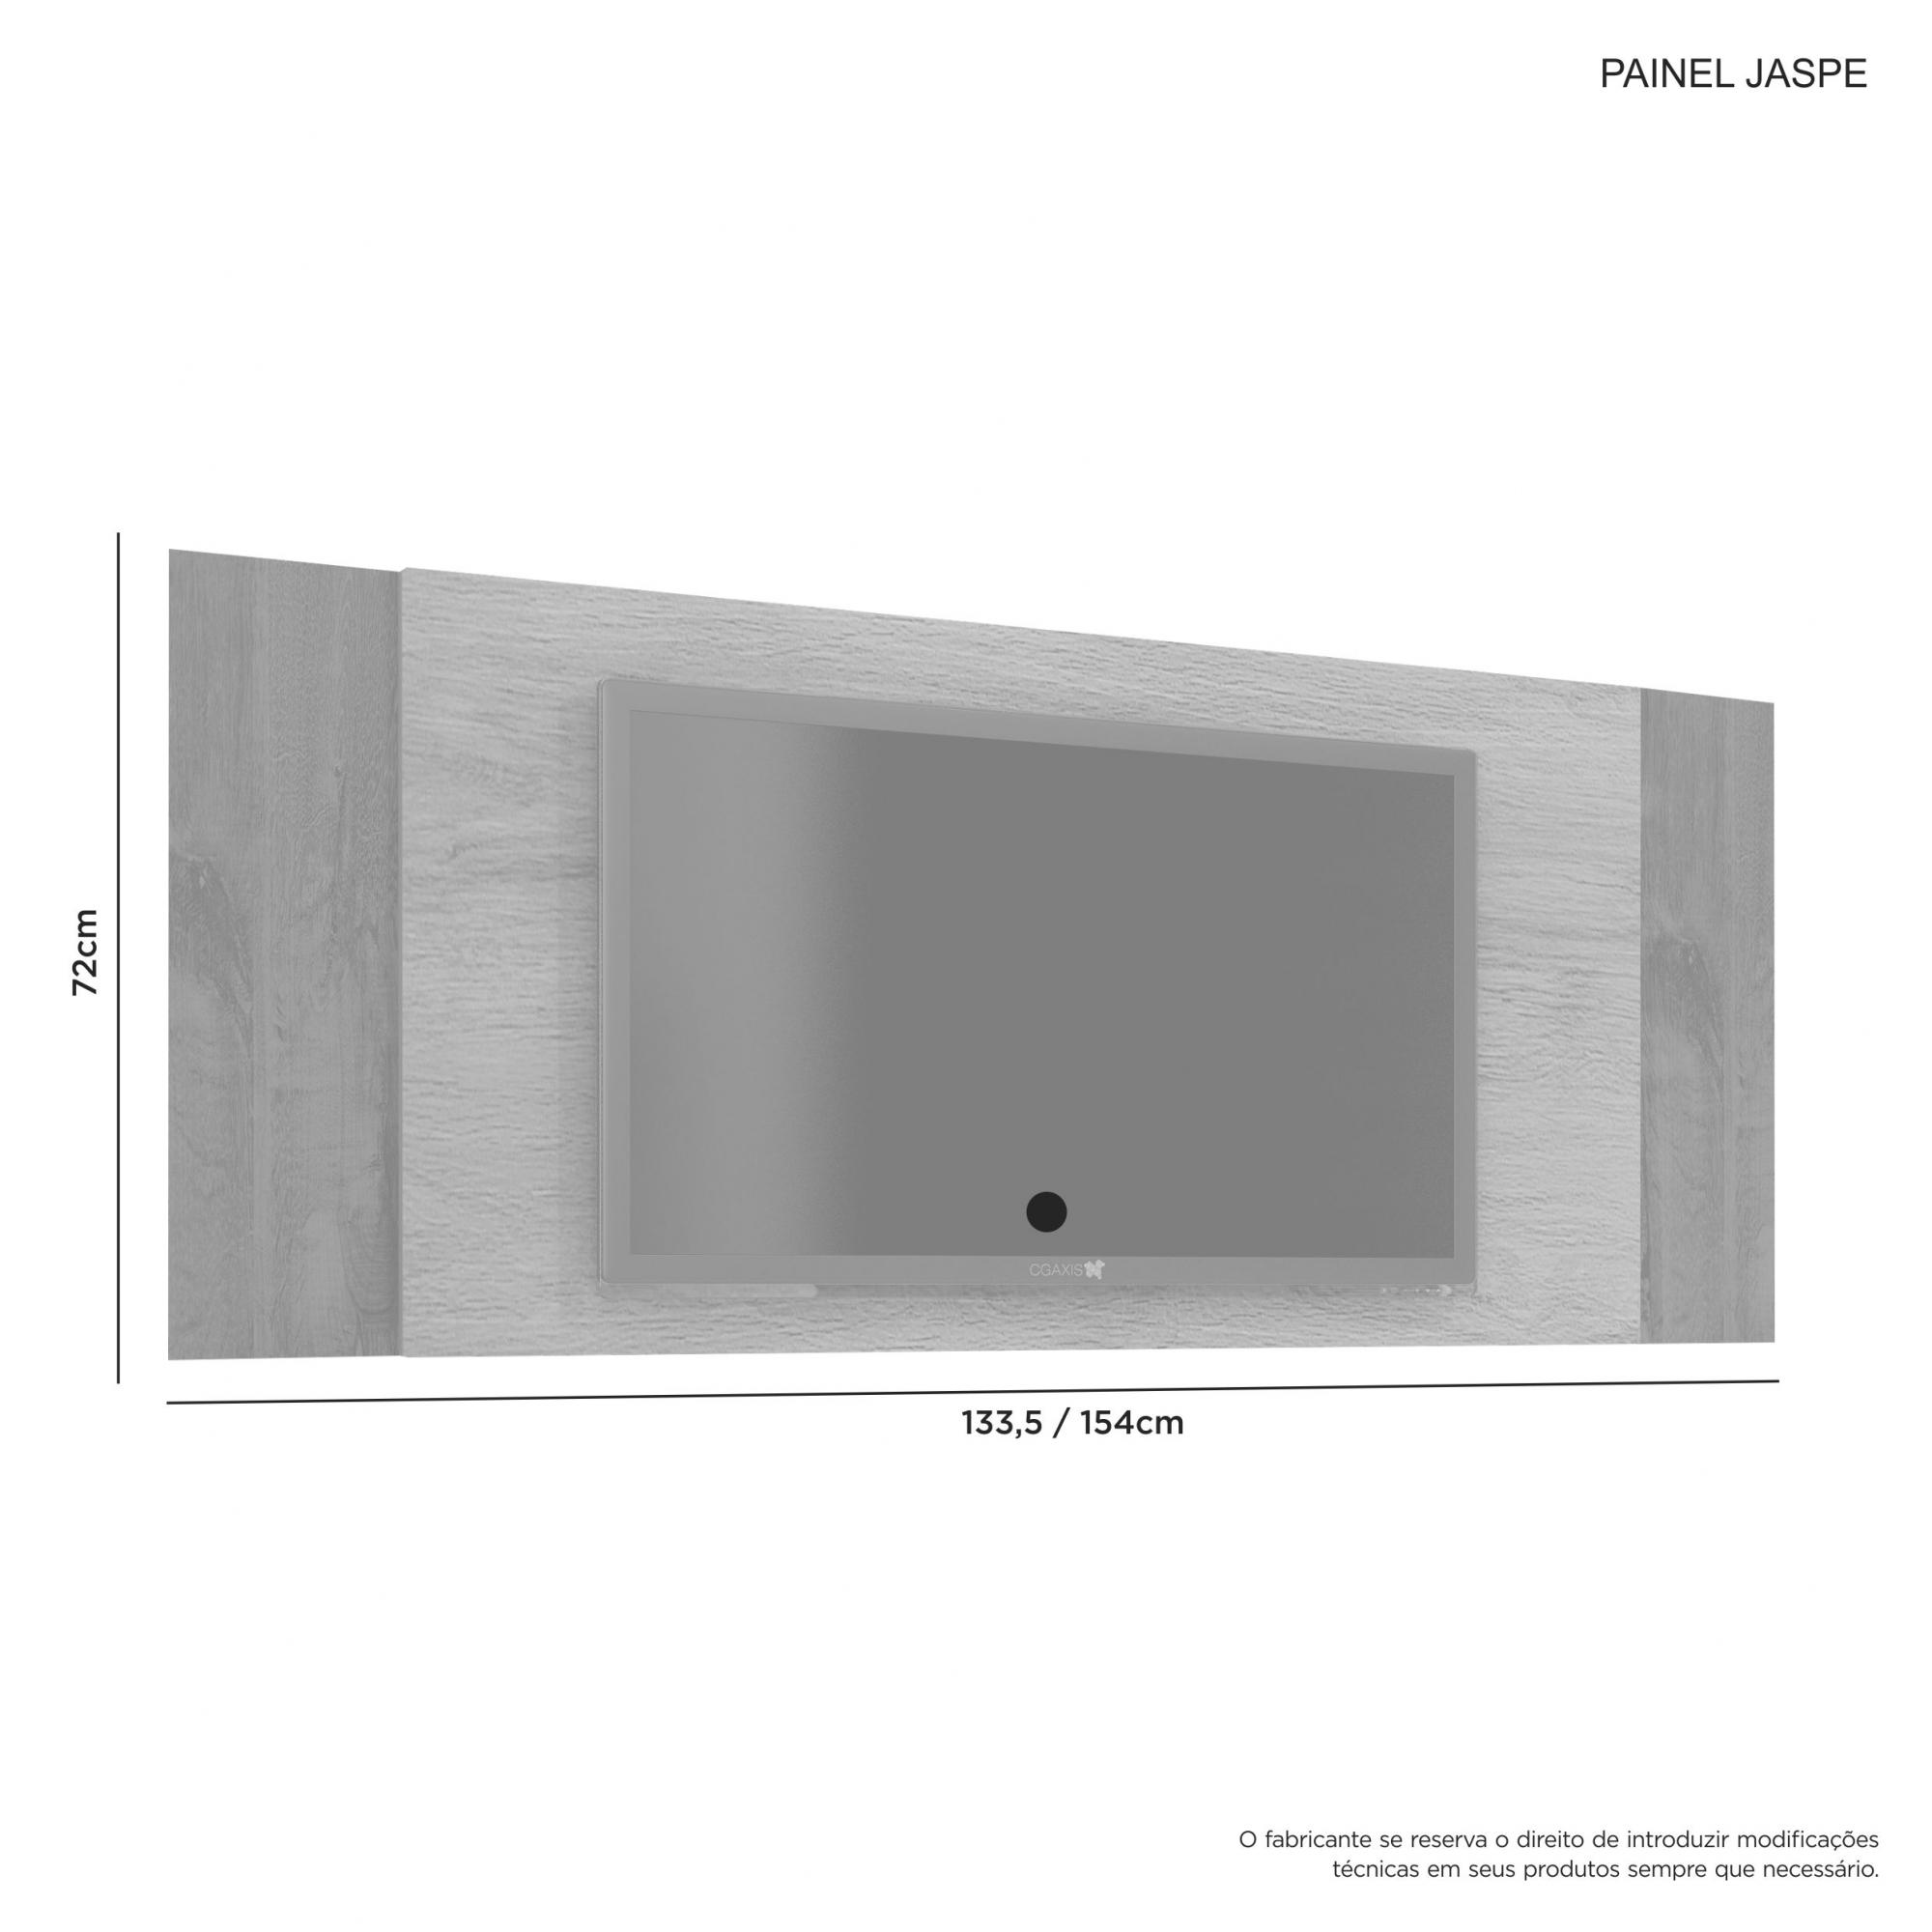 Painel Jaspe Para Sala Tv Casa Quarto Ideal Até 42'' JCM